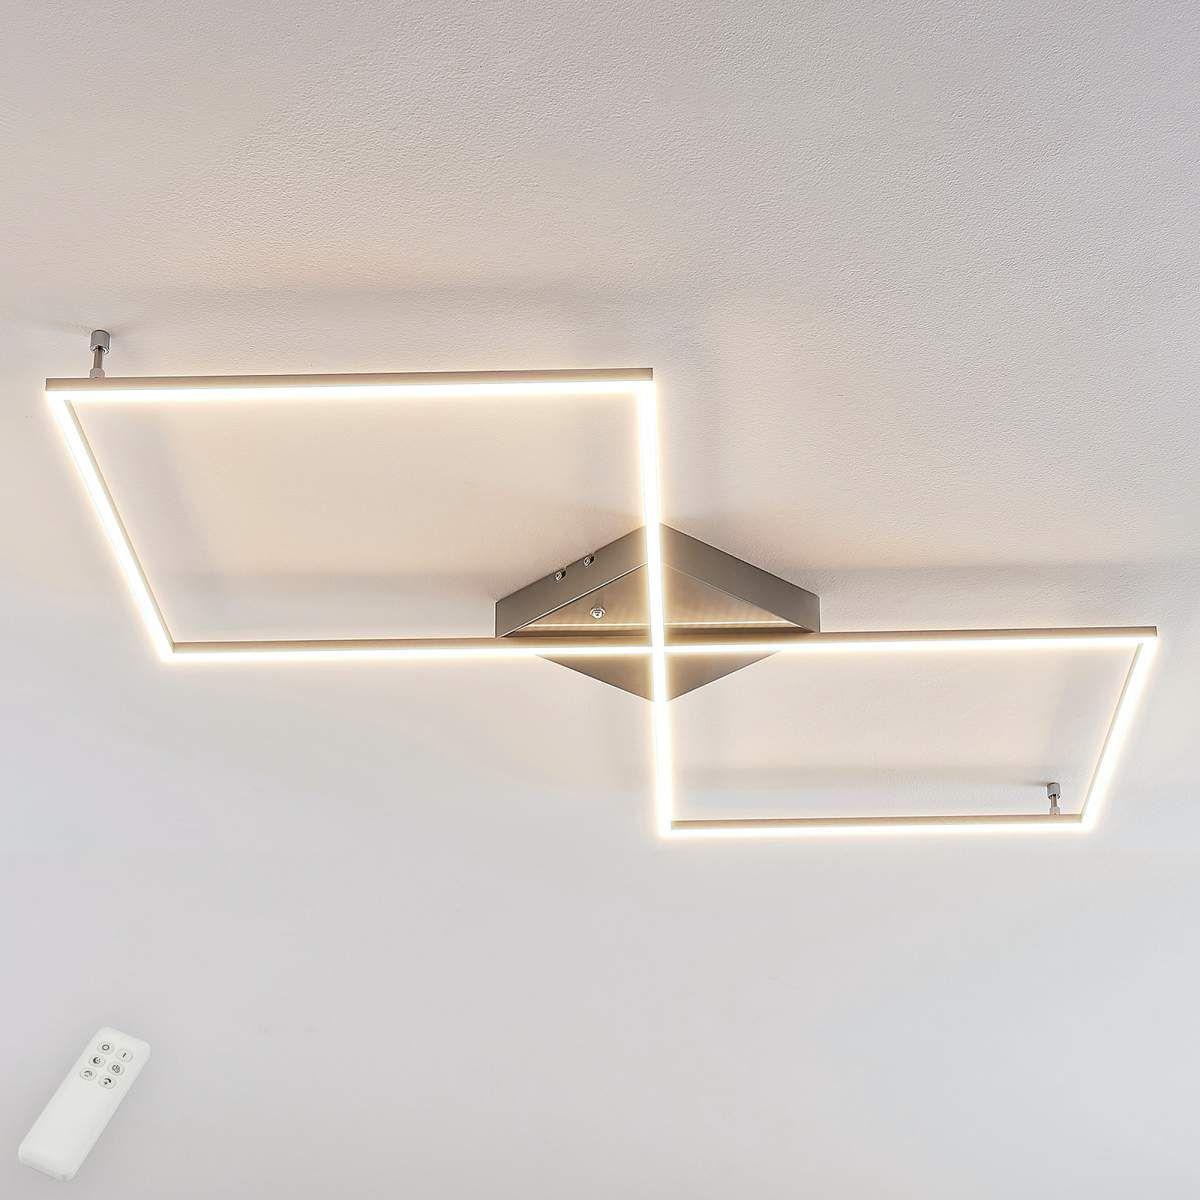 Geradlinige Led Deckenlampe Romee M Fernbedienung In 2020 Led Deckenlampen Led Deckenleuchte Deckenlampe